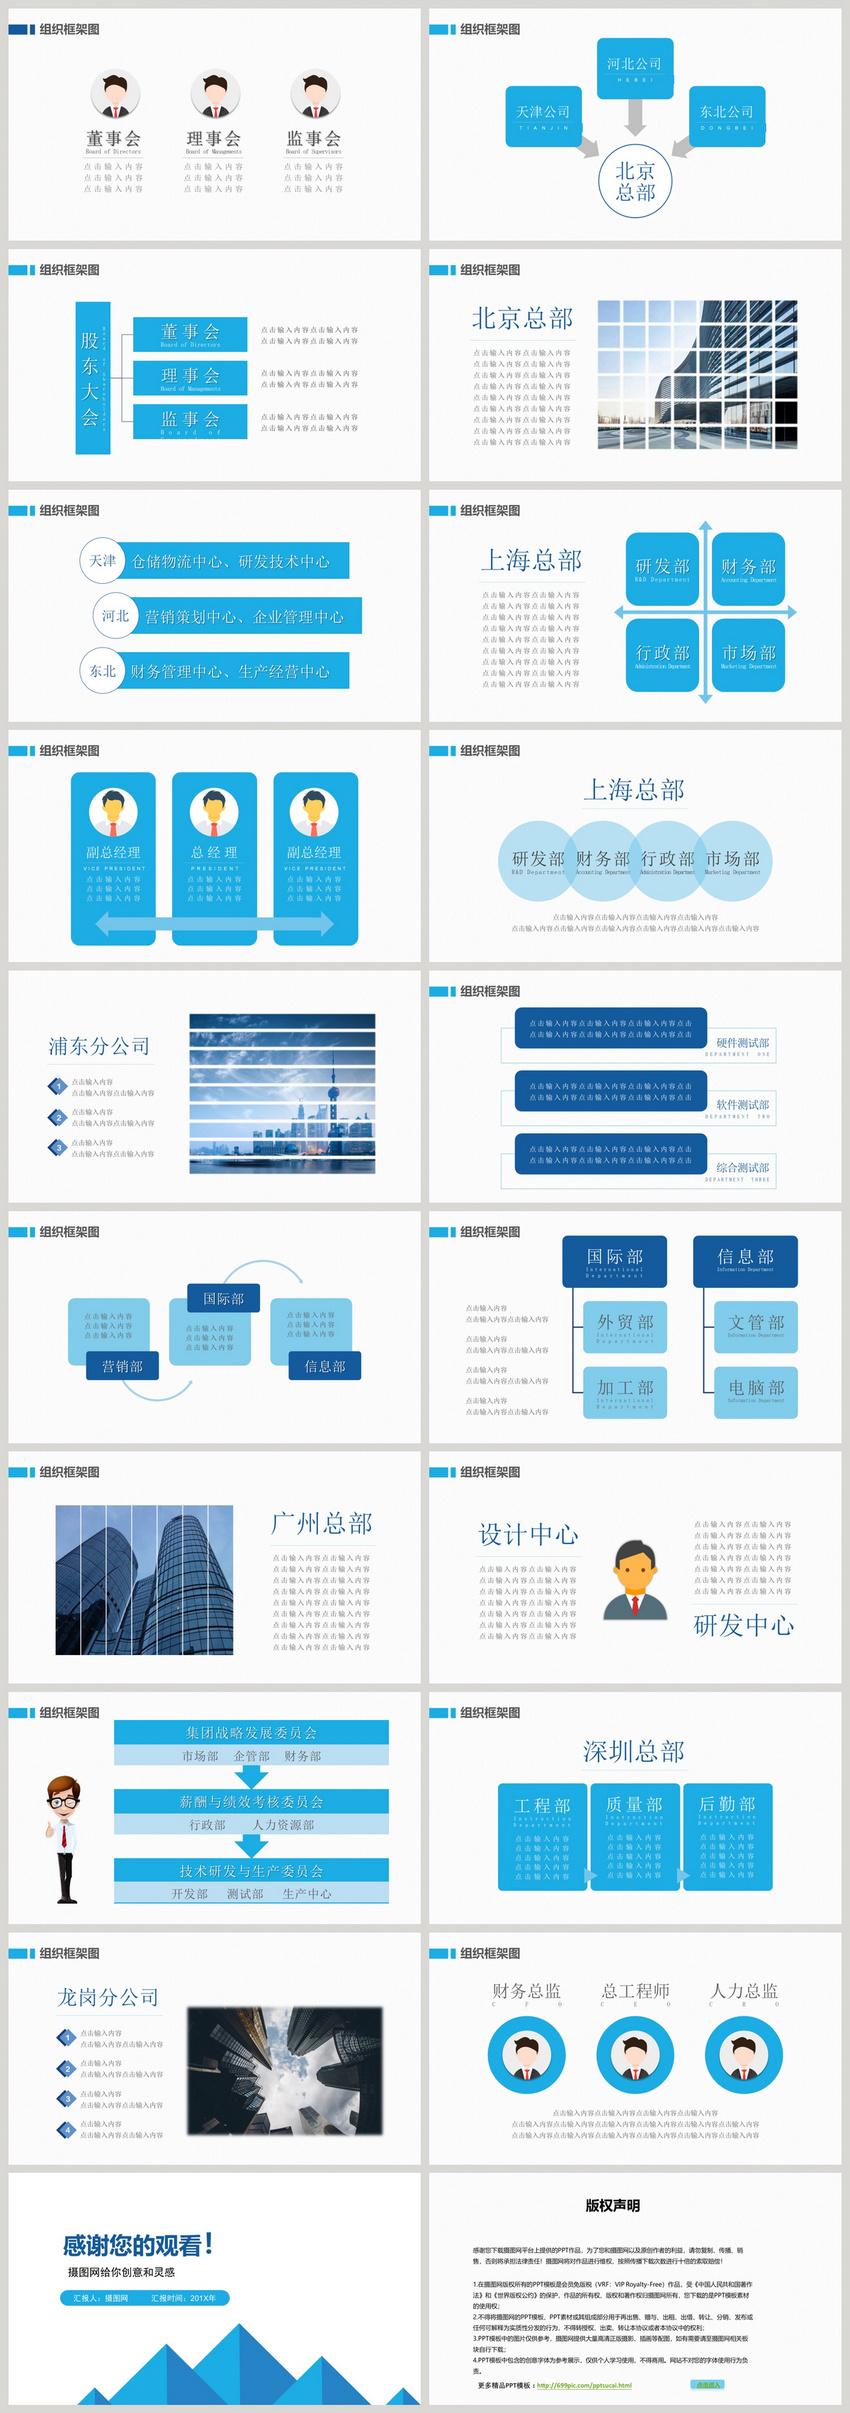 Enterprise Organization Architecture Diagram Ppt Template Powerpoint Templete Ppt Free Download 400130862 Lovepik Com